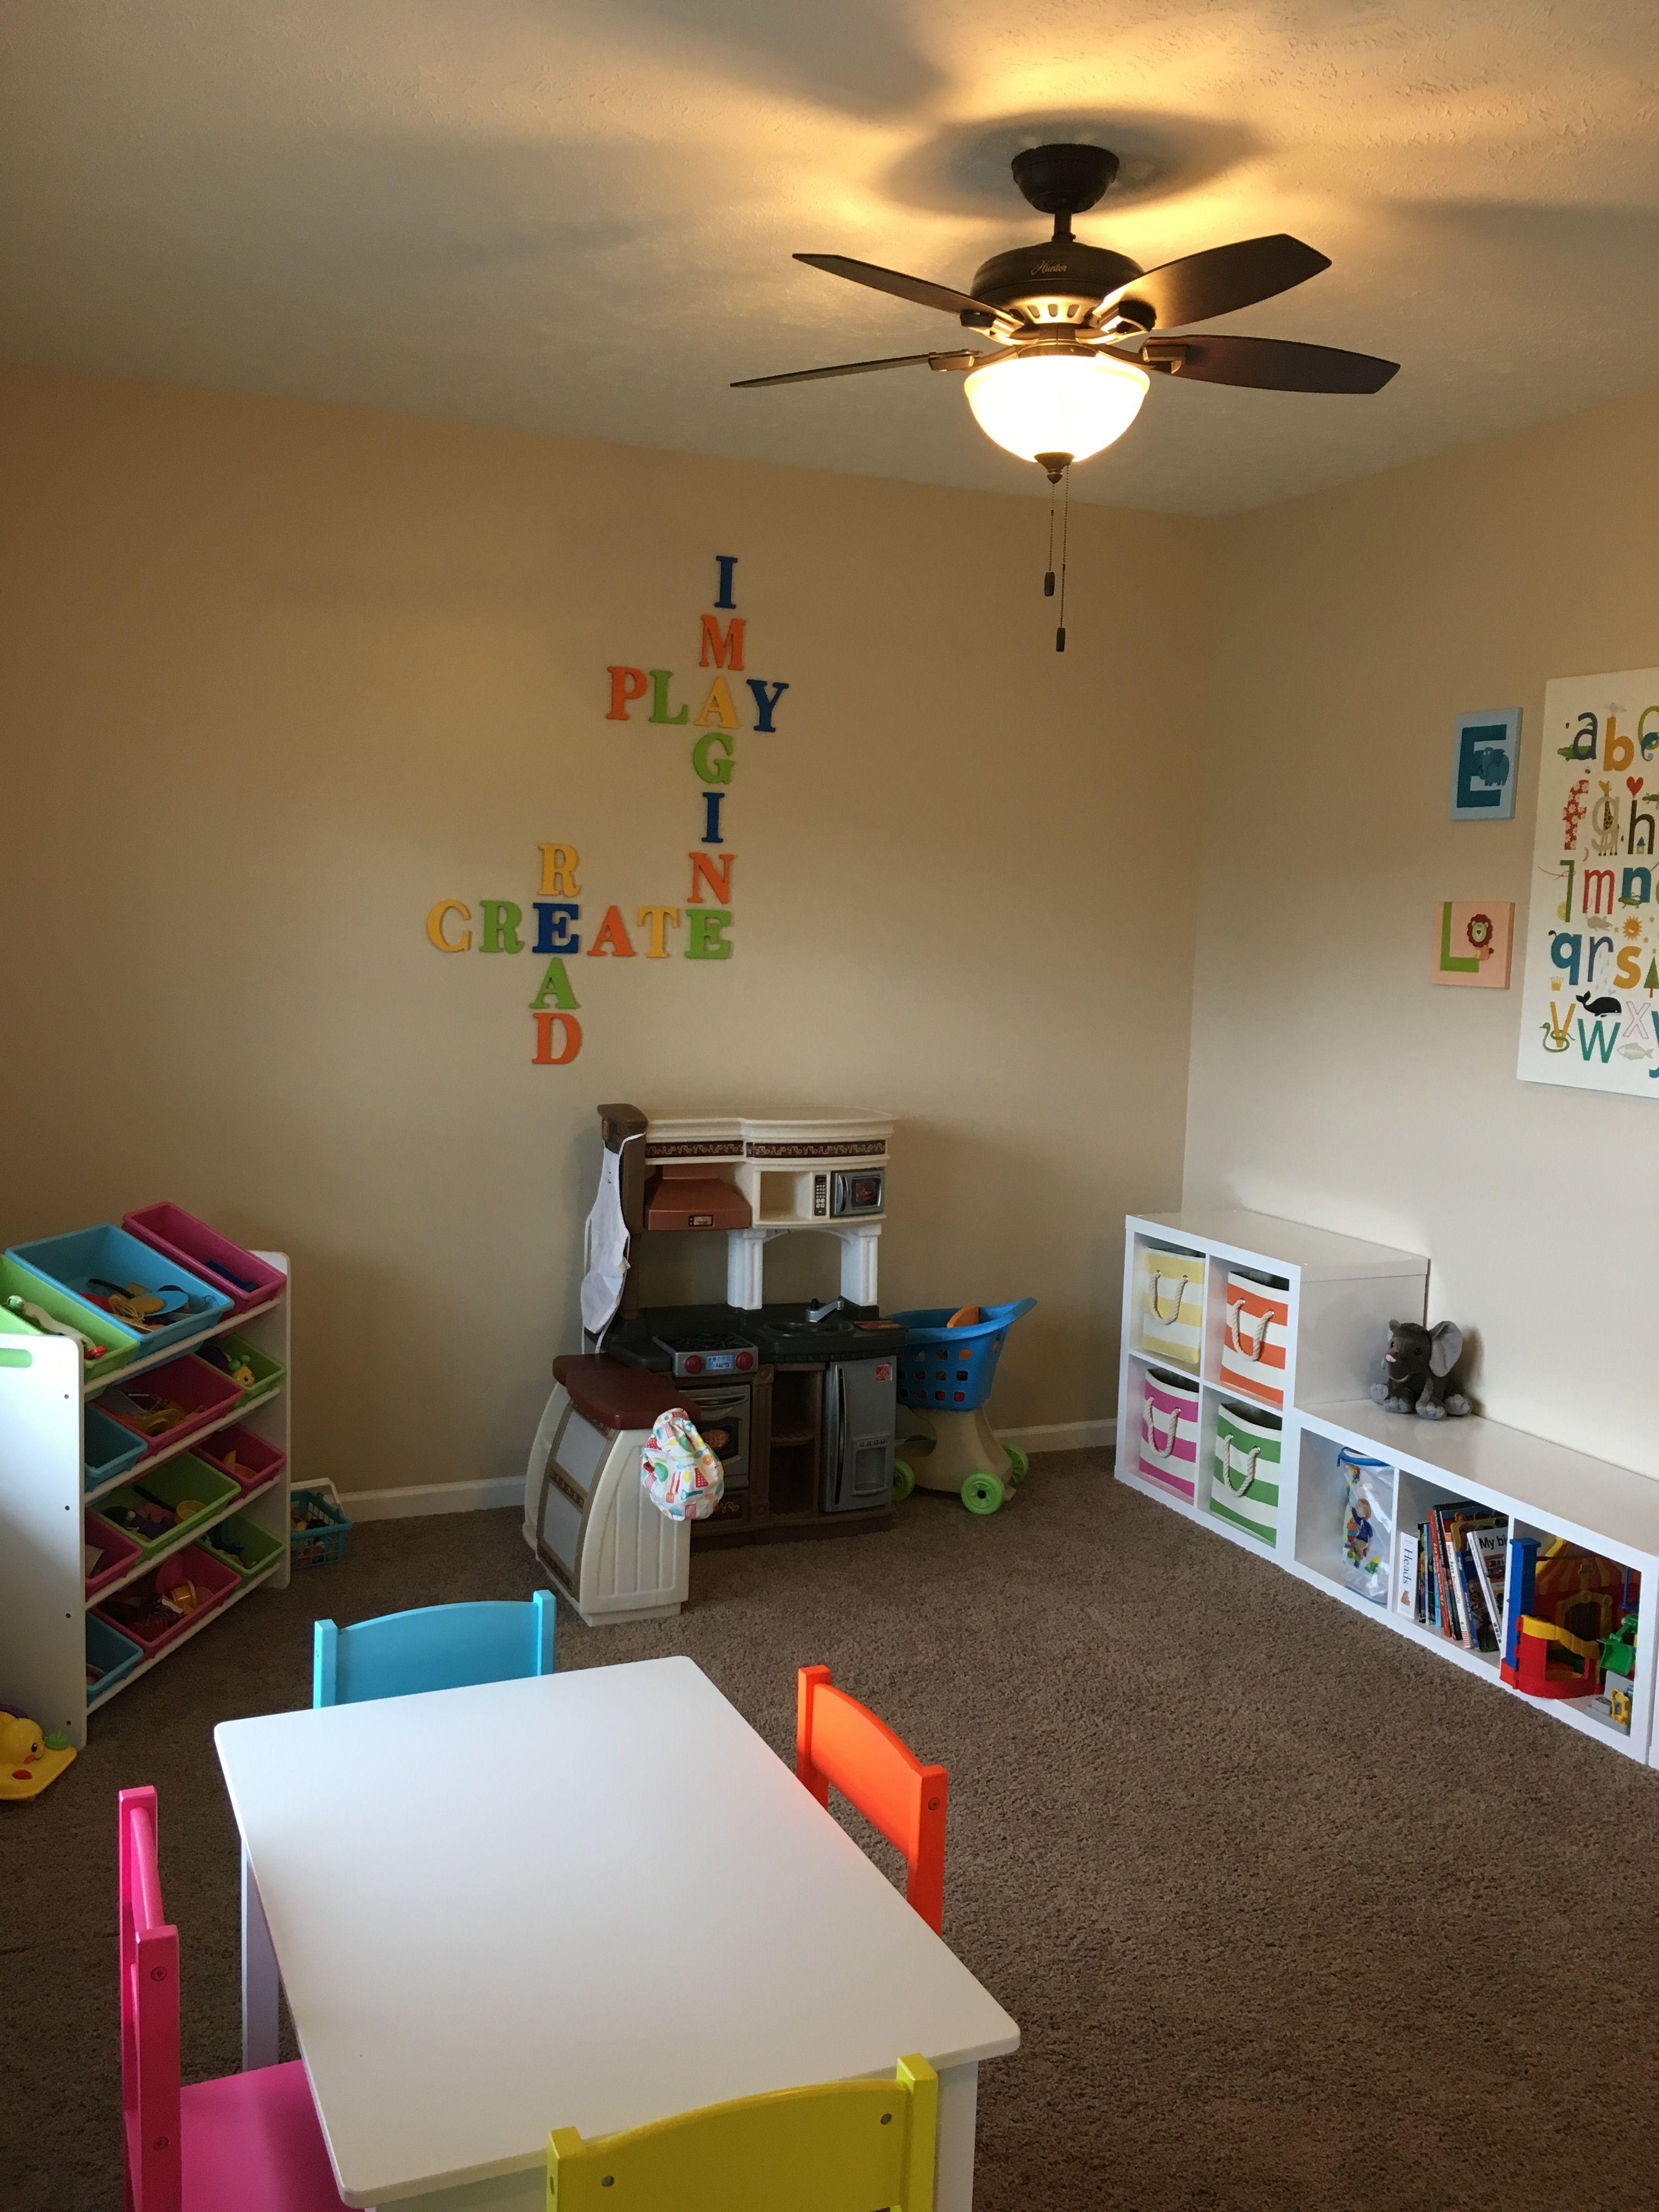 Playroom | Playroom, Home decor, Decor